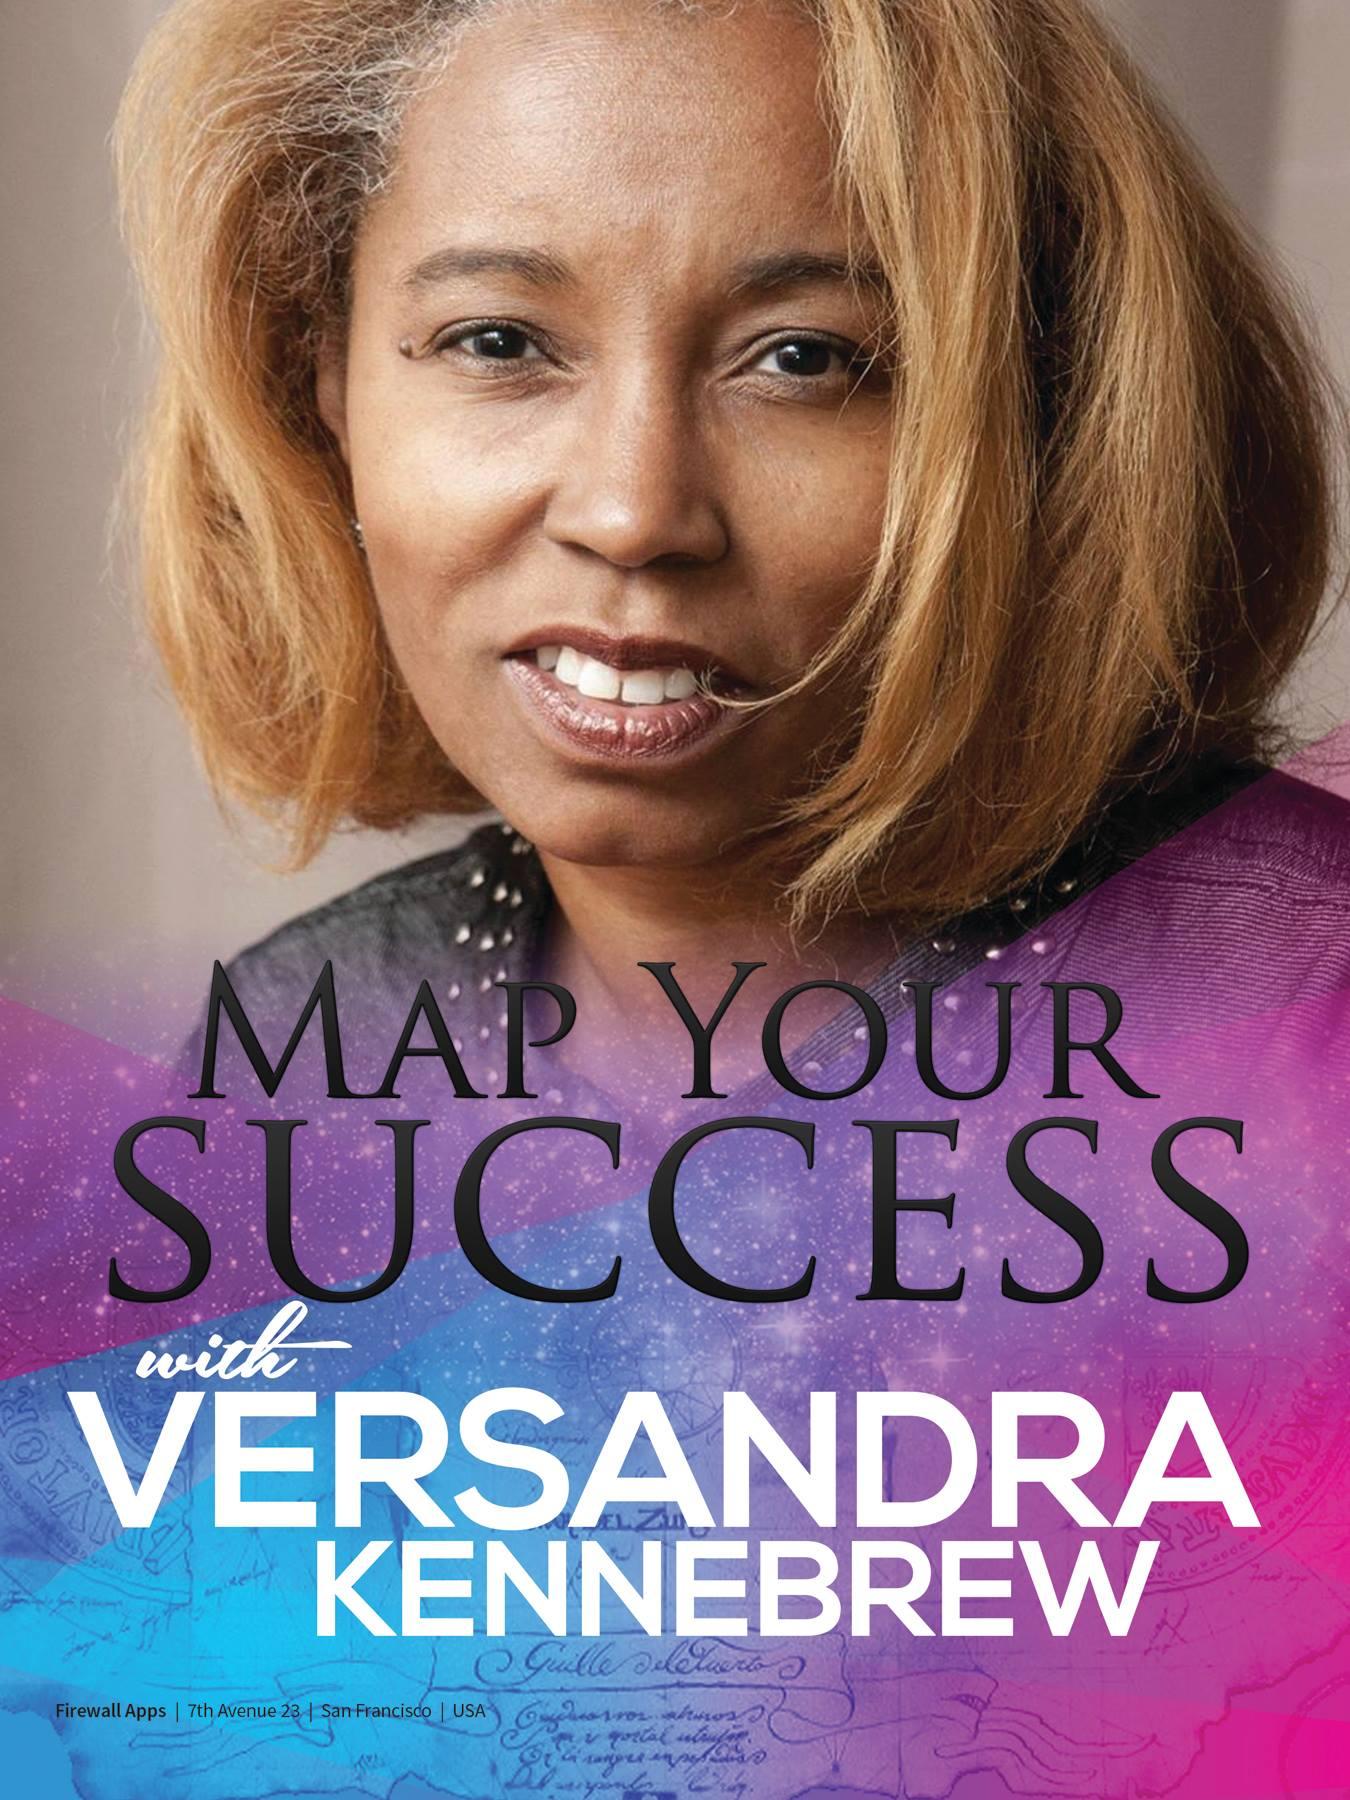 Author Versandra Kennebrew